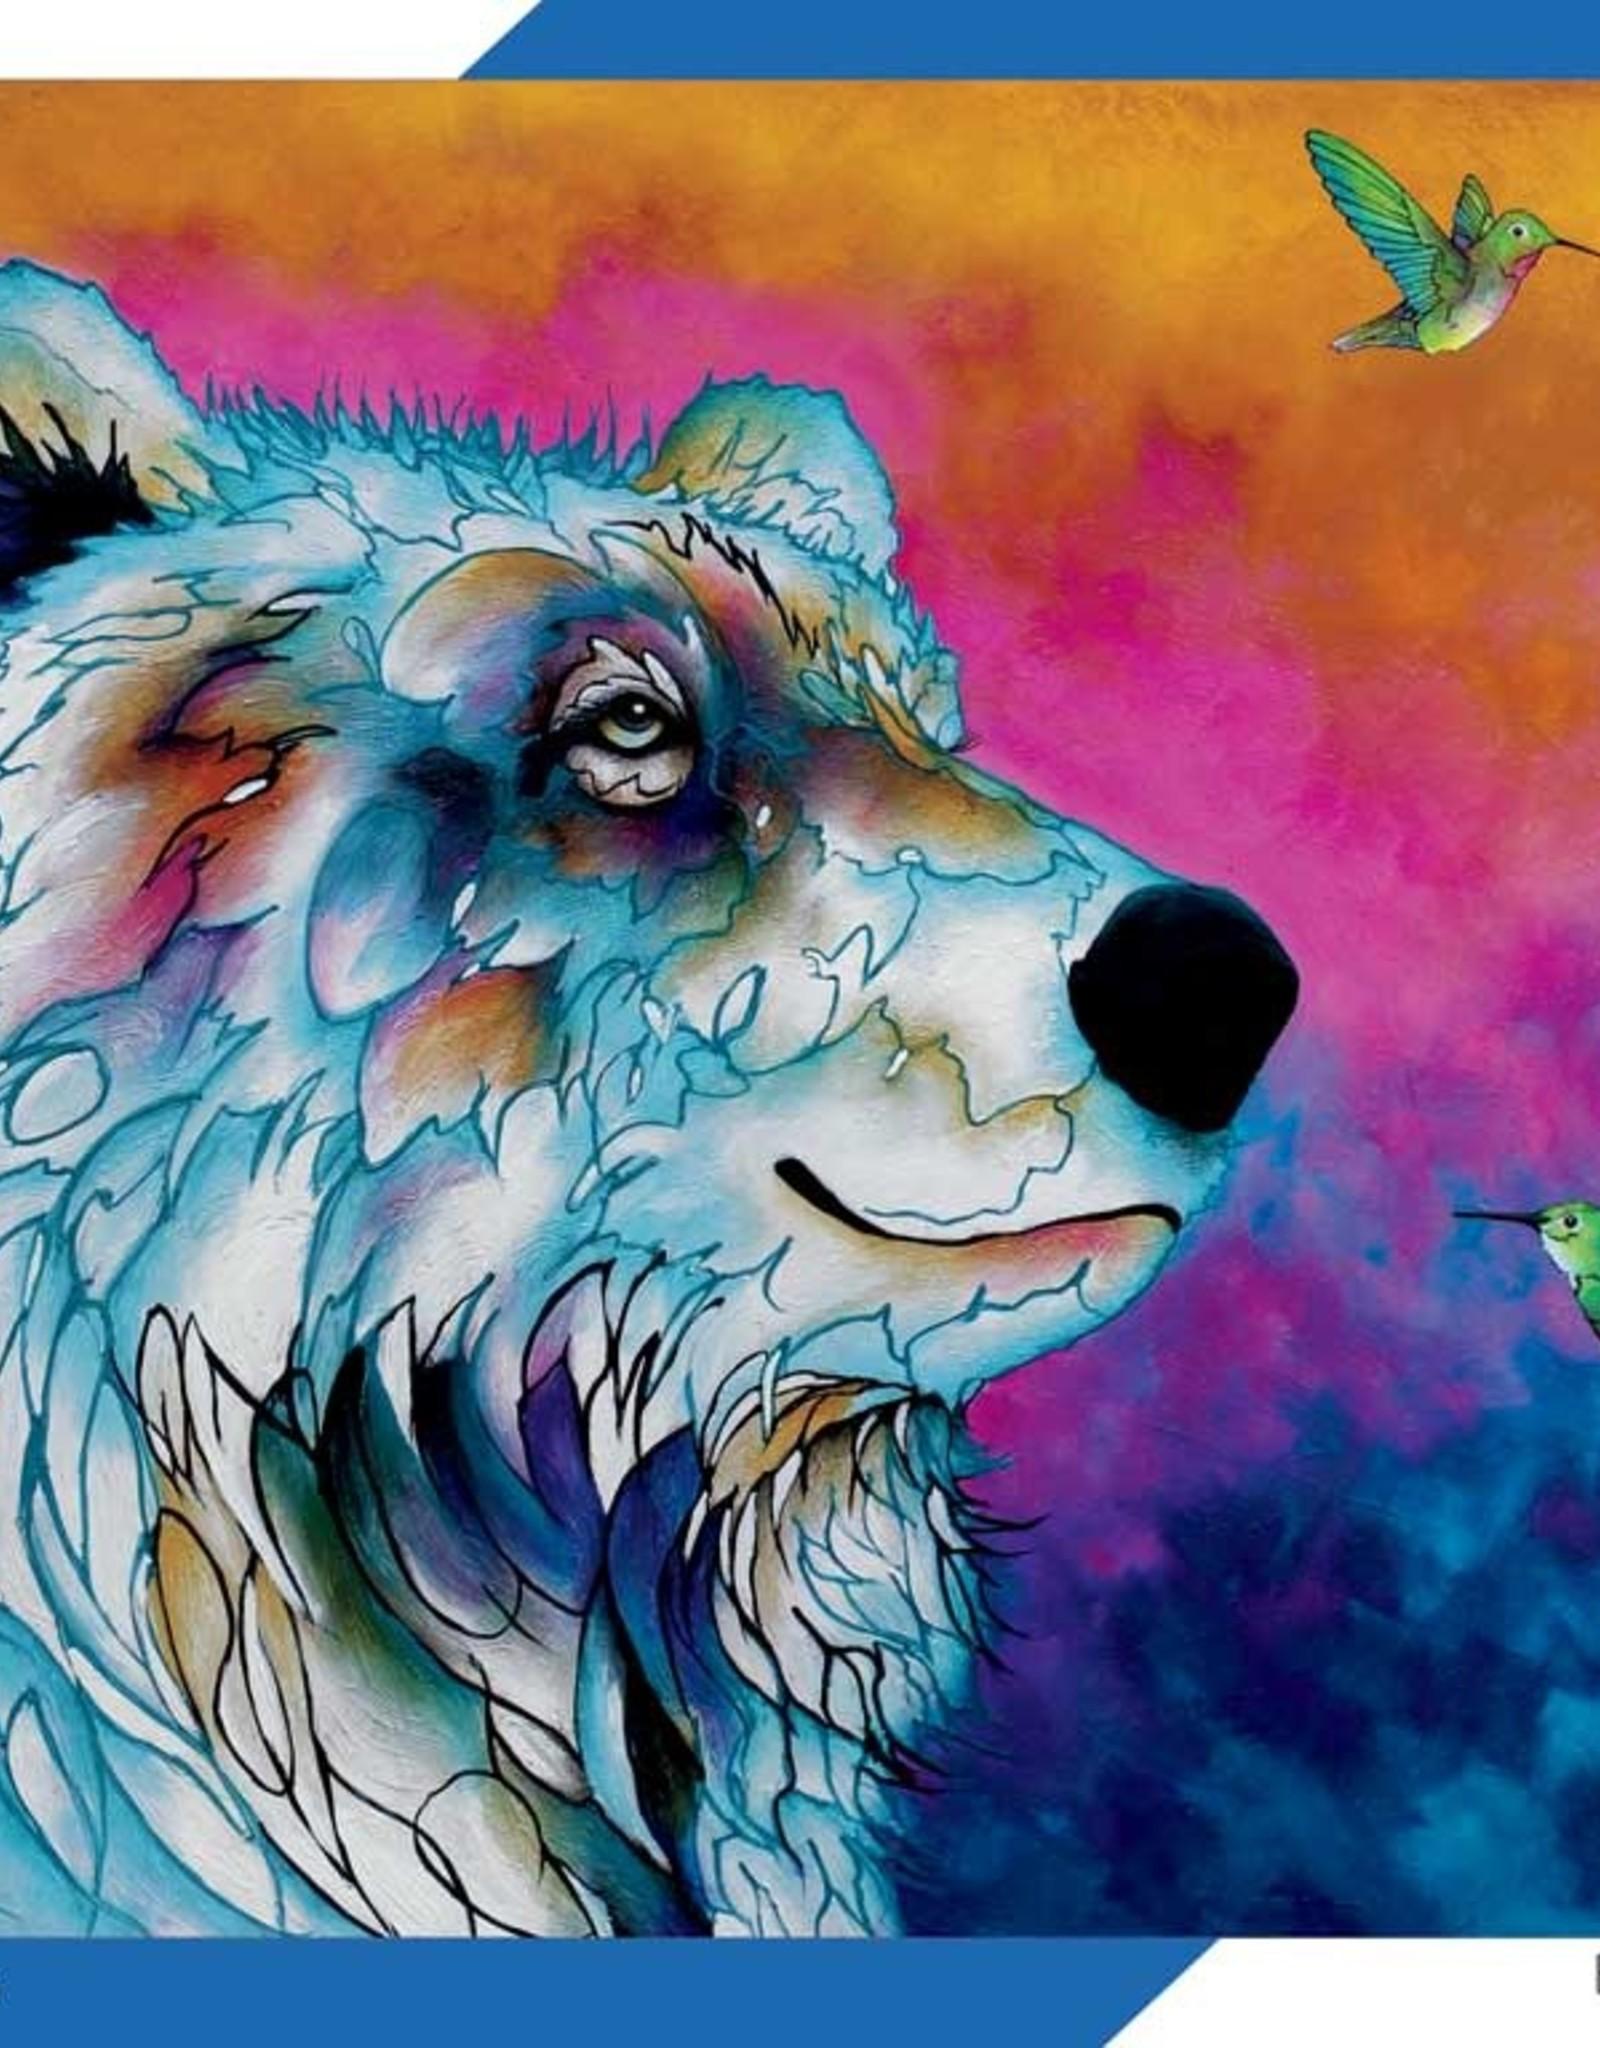 Puzzle-Sunrise Tales by Micqaela Jones